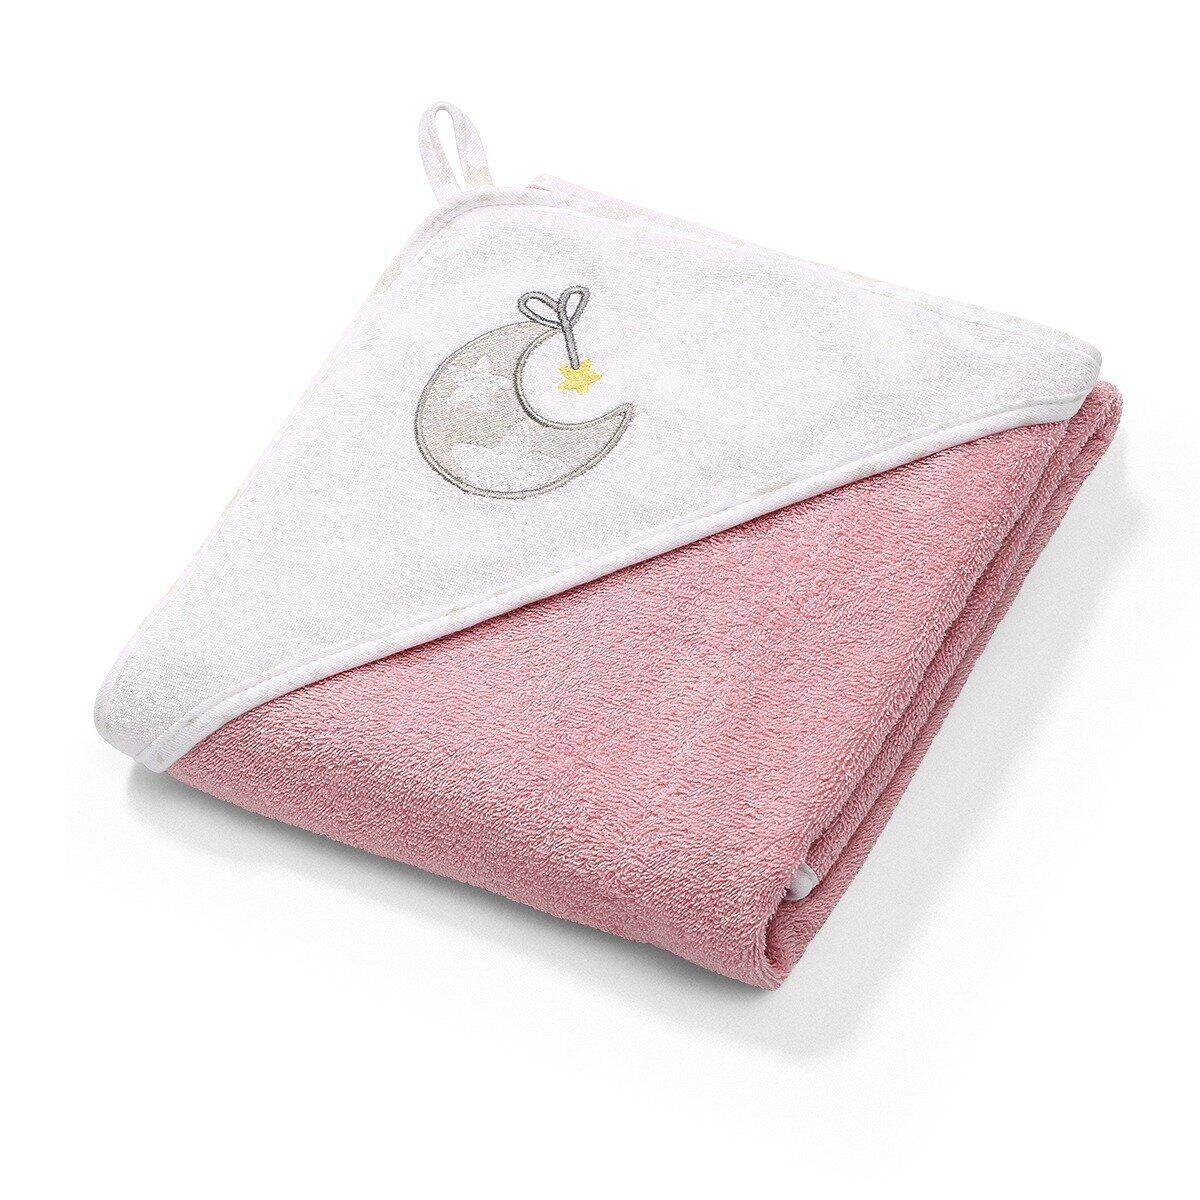 Полотенце махровое с капюшоном BabyOno 100х100 см Месяц (розовое)